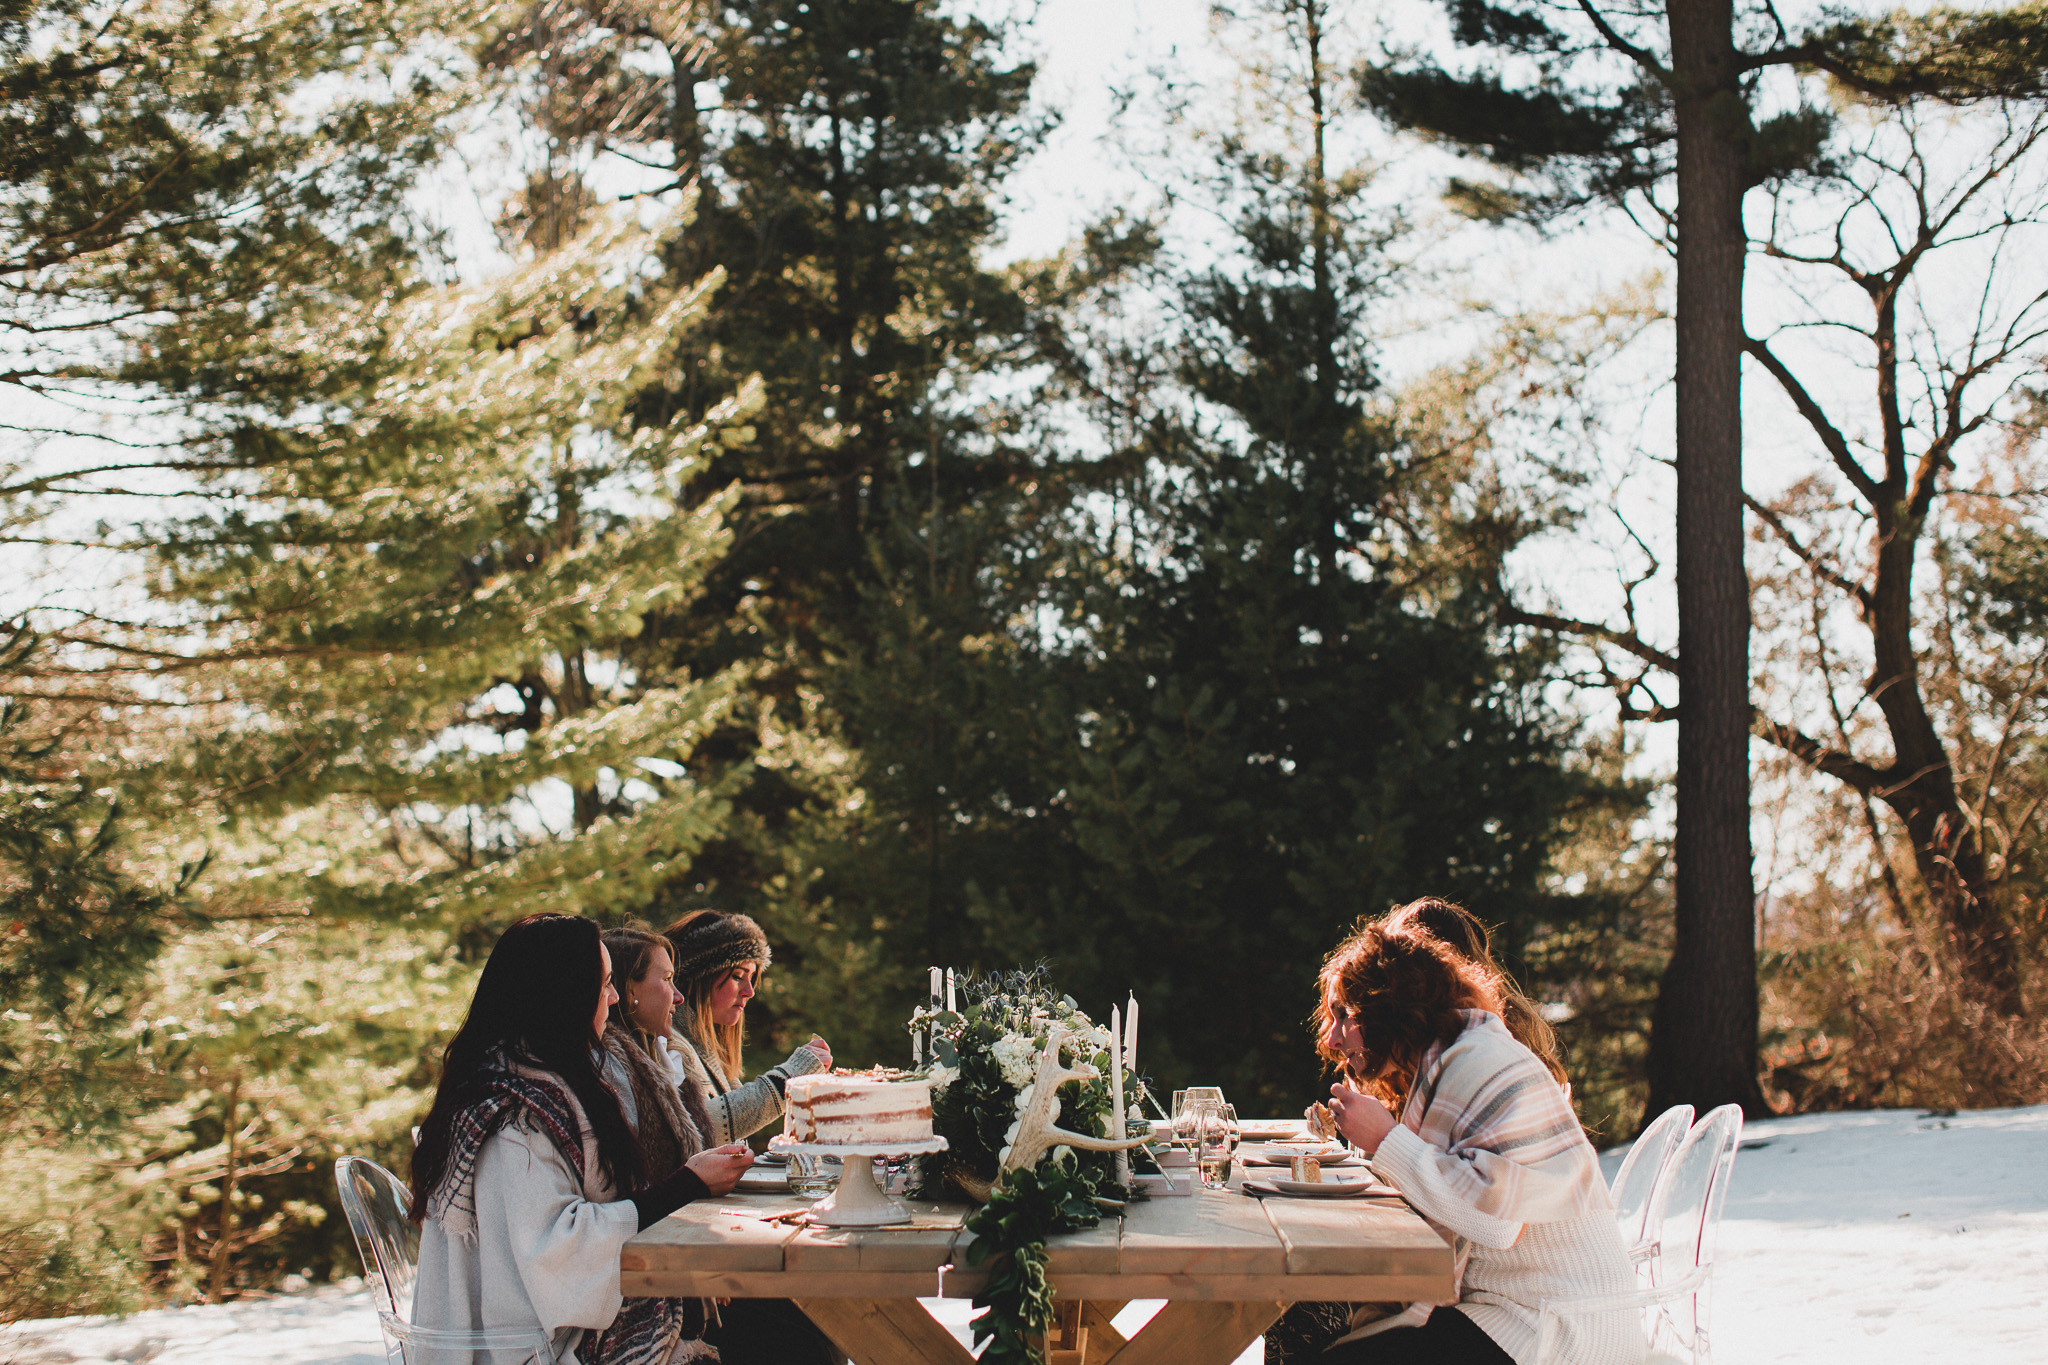 Outdoorsy Woodsy Wedding Style